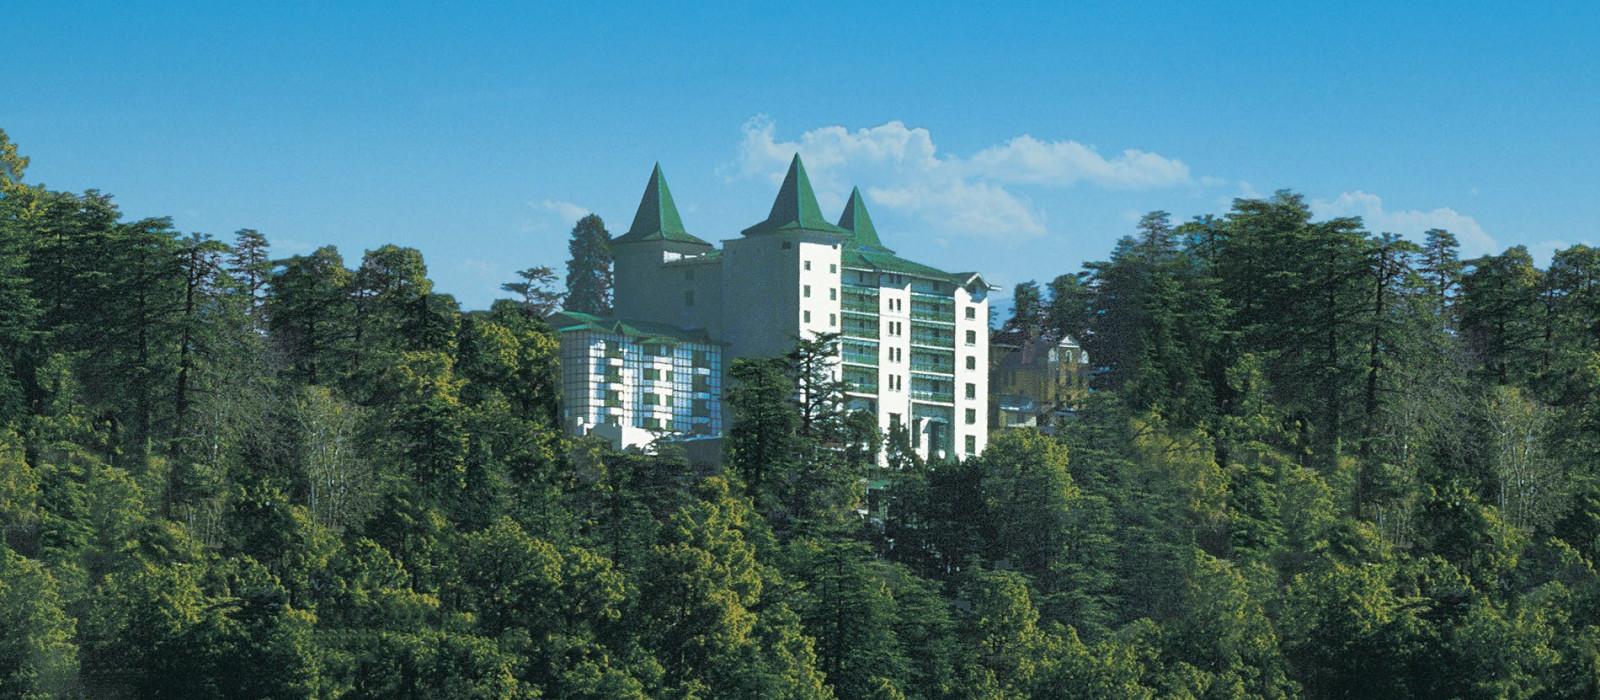 Hotel The Oberoi Cecil, Shimla Himalayas